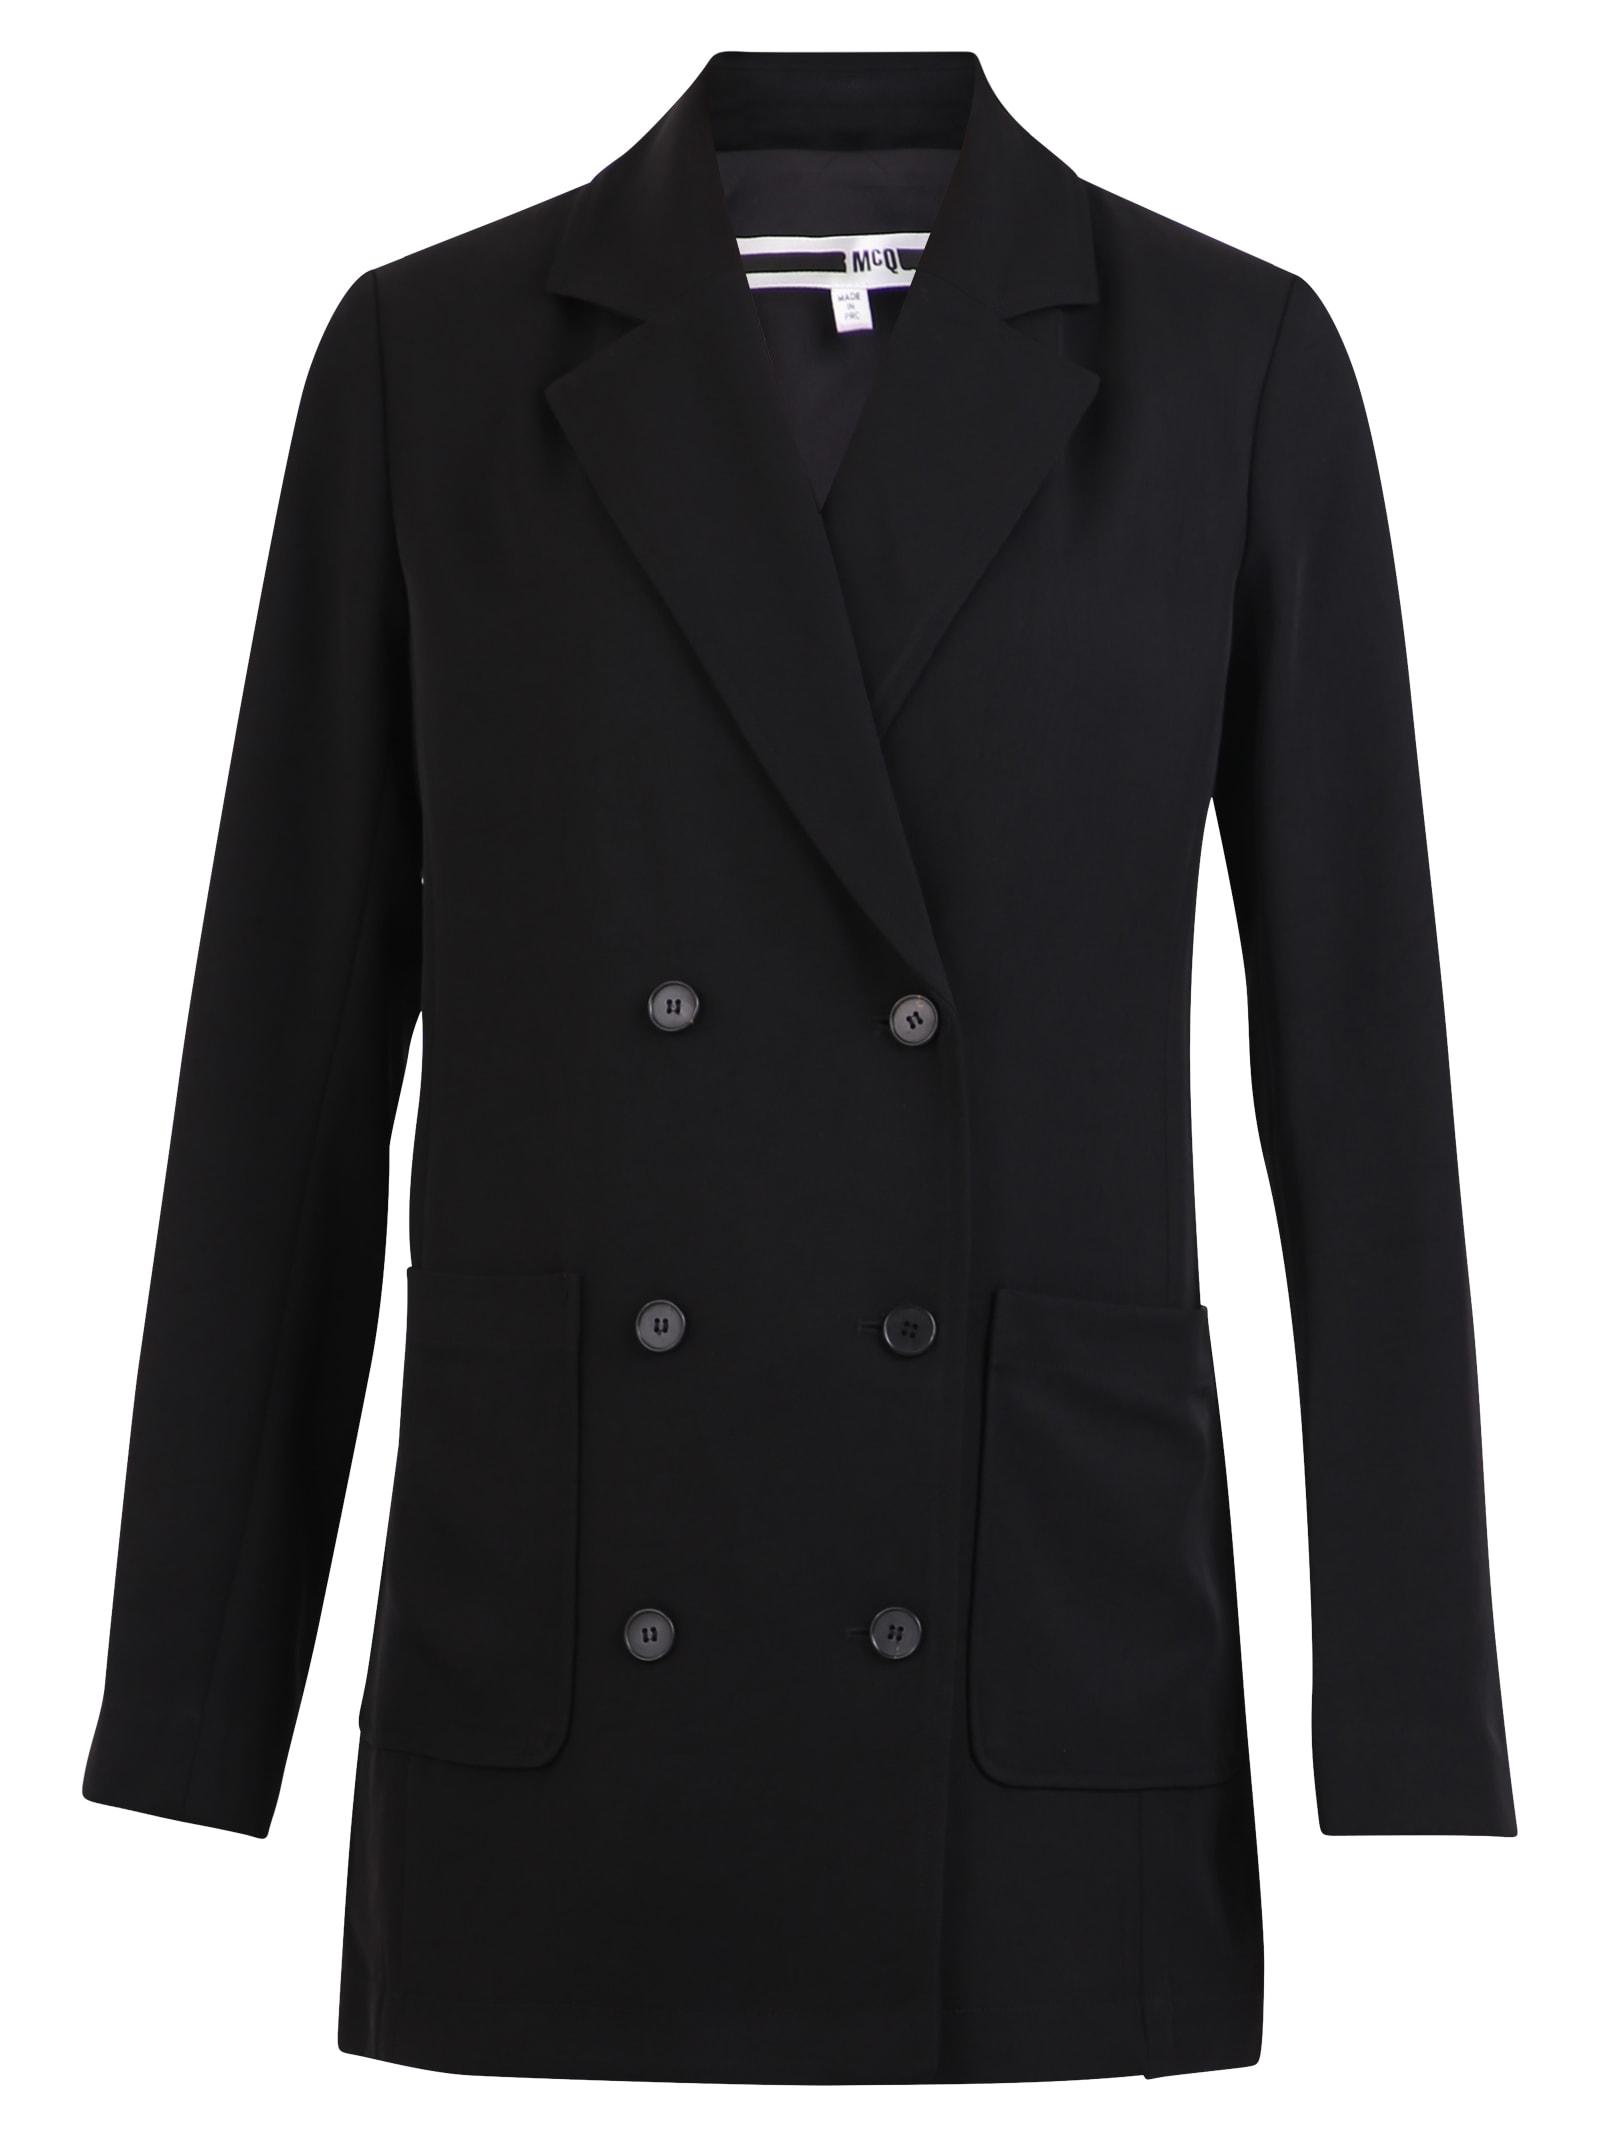 Photo of  McQ Alexander McQueen Double-breasted Blazer- shop McQ Alexander McQueen jackets online sales